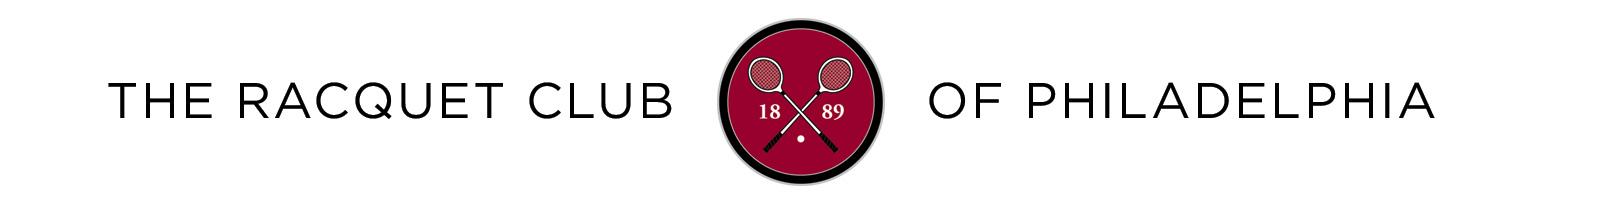 The Racquet Club of Philadelphia Logo